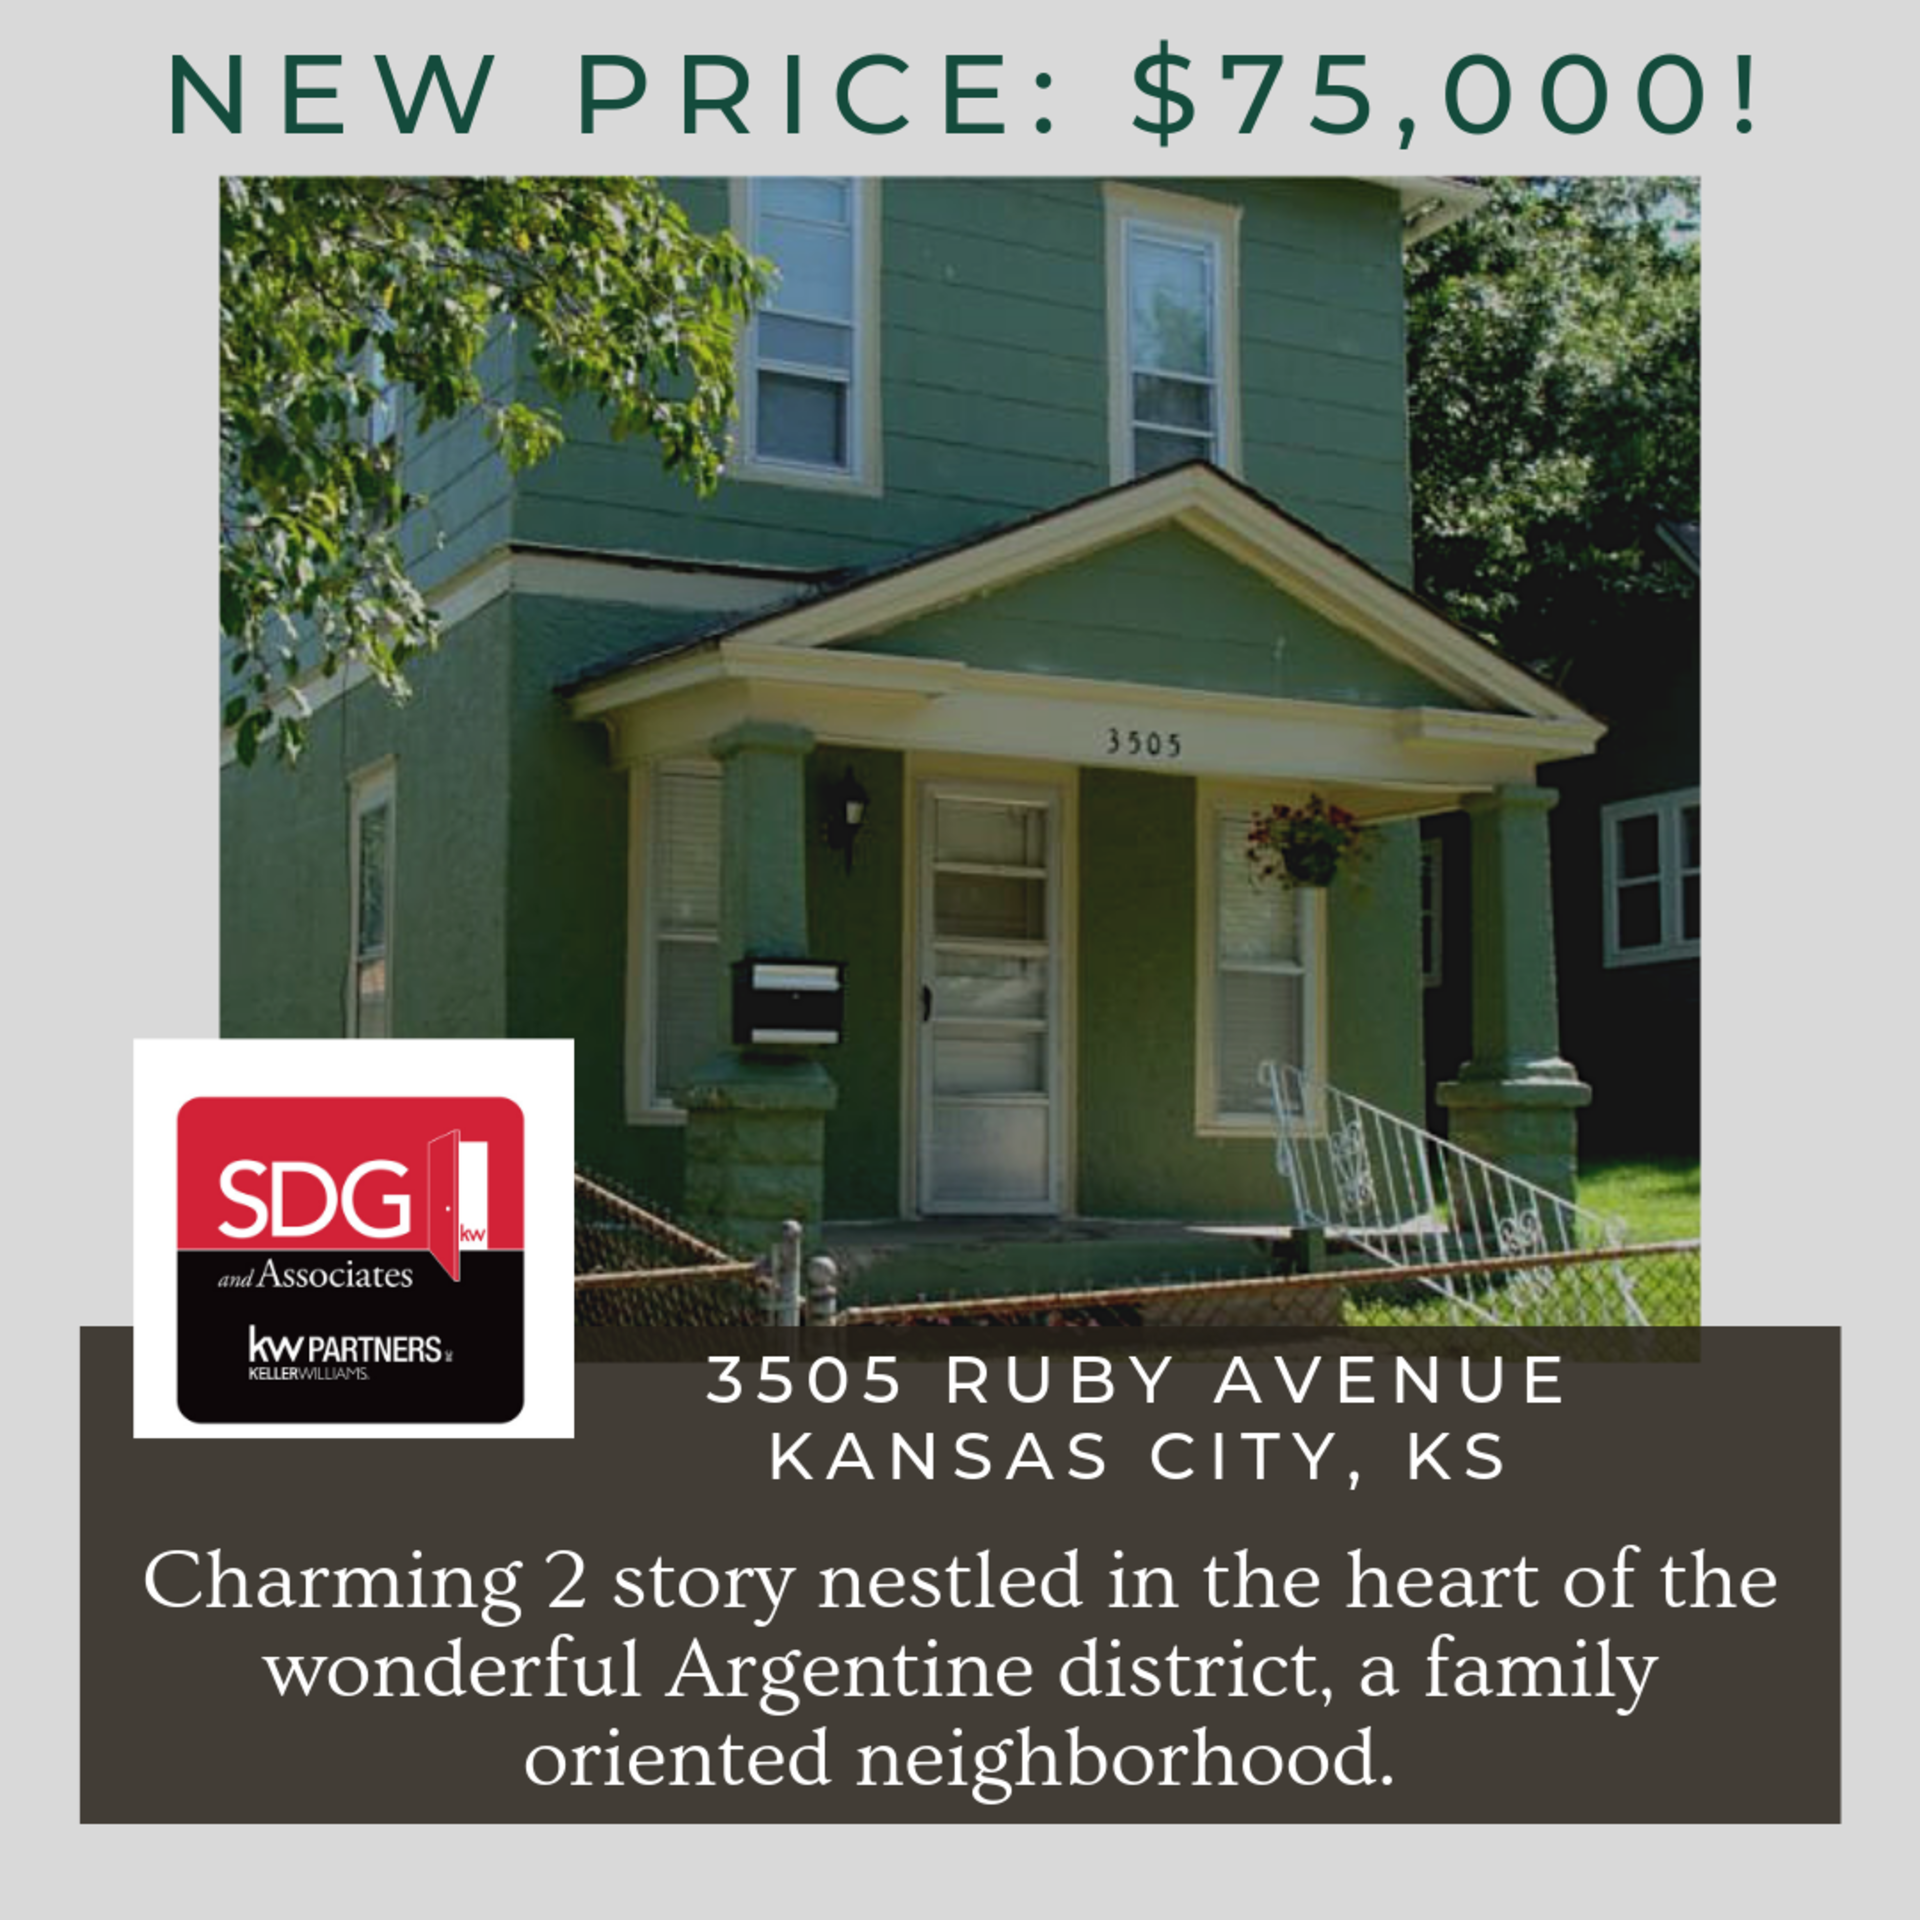 Charming 2 Story in Kansas City KS for $75K – Bring All Offers!